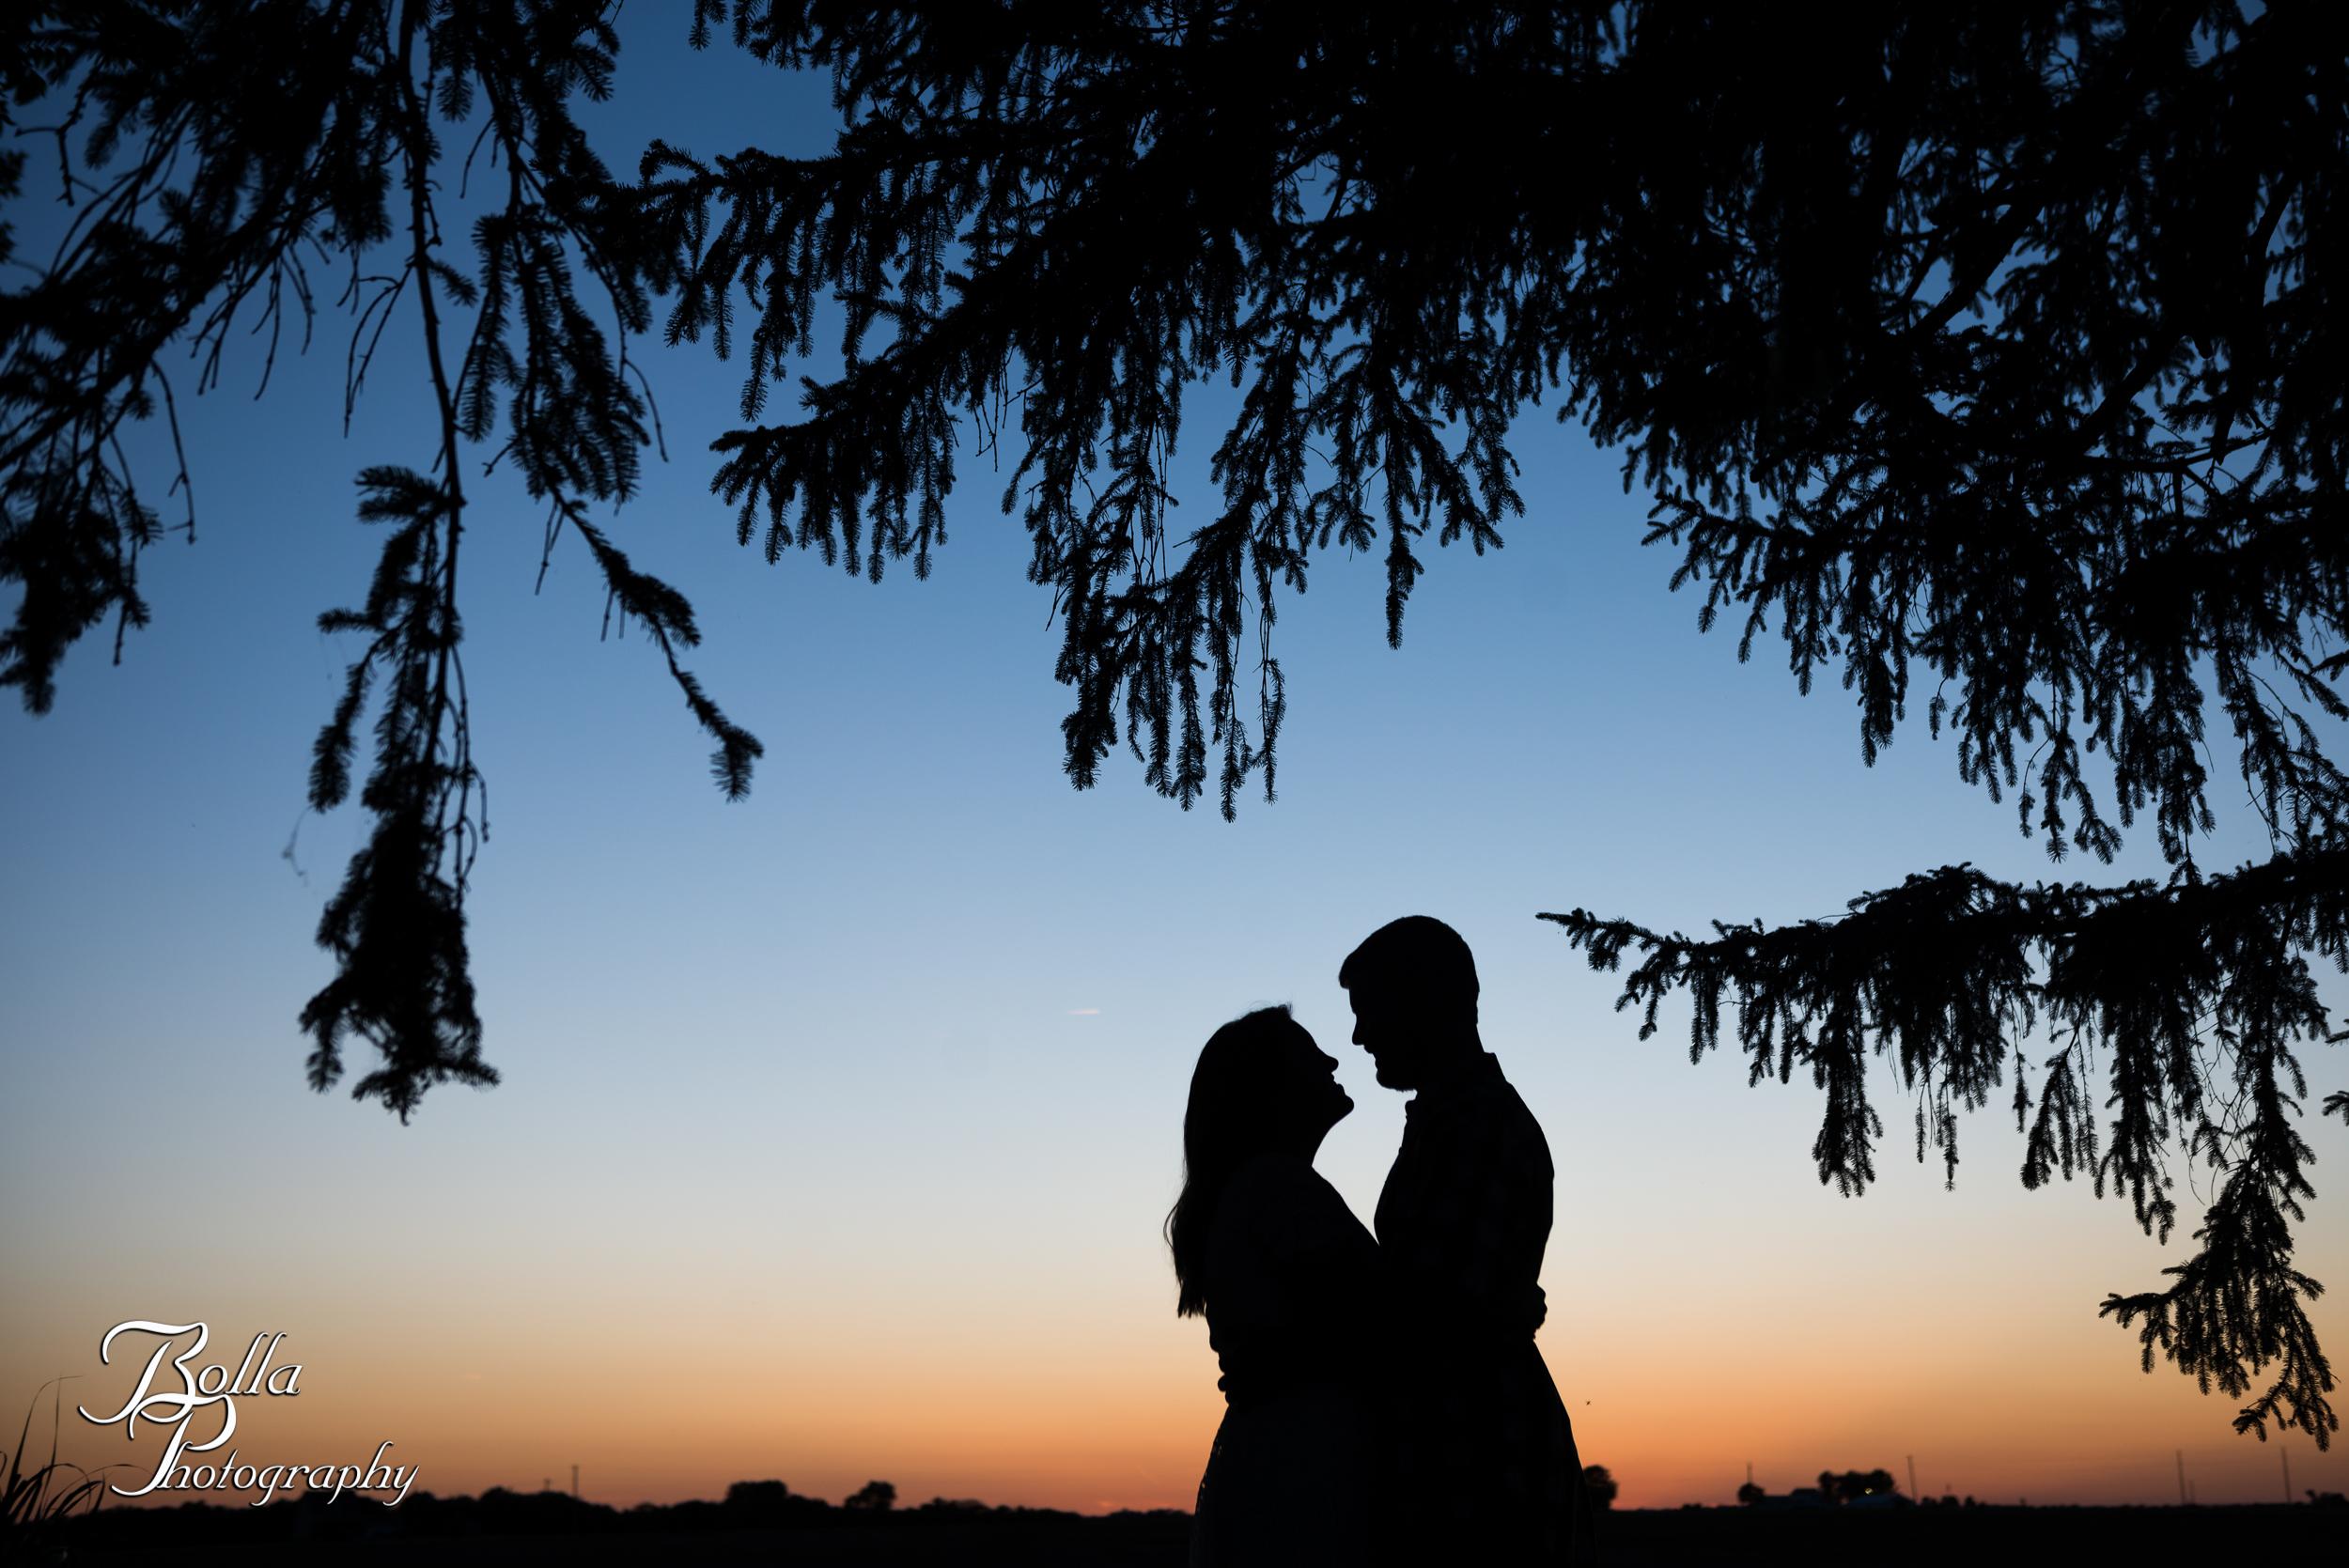 20170606_Bolla photography edwardsville wedding newborn photographer st louis weddings babies-0005.jpg